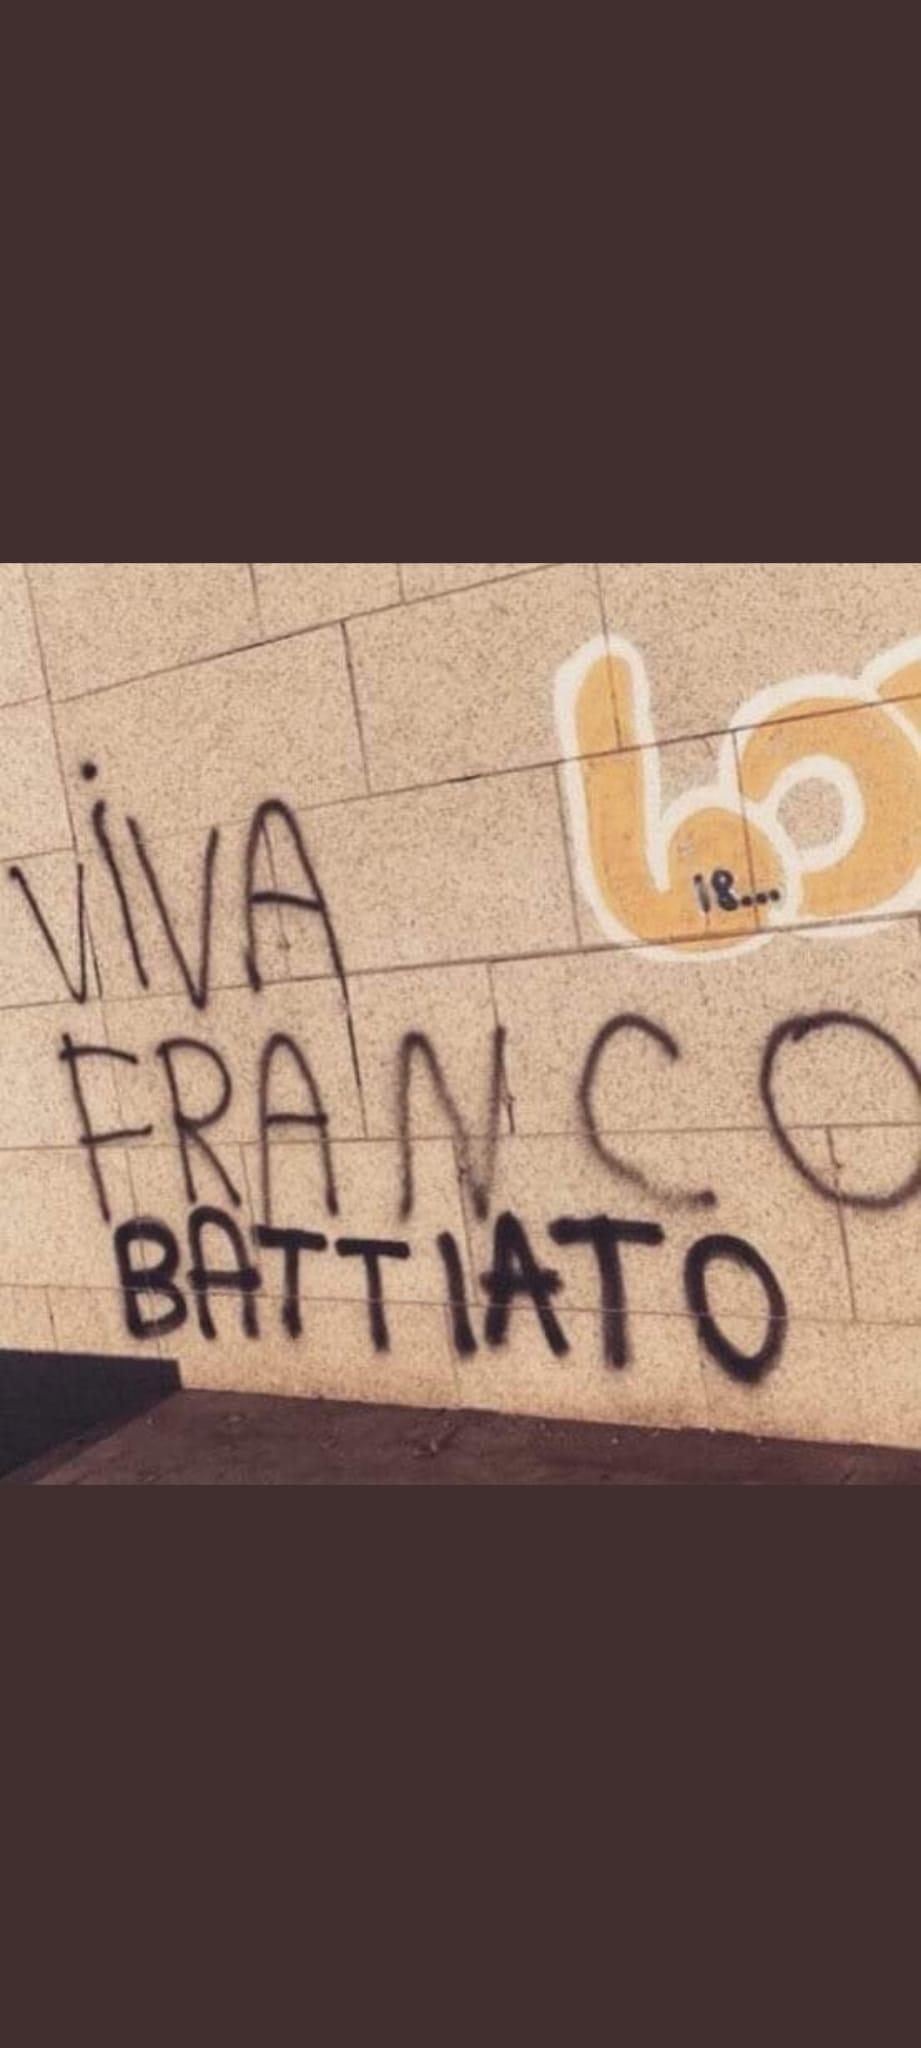 FRANCO BATTIATO - Página 3 Img-2010